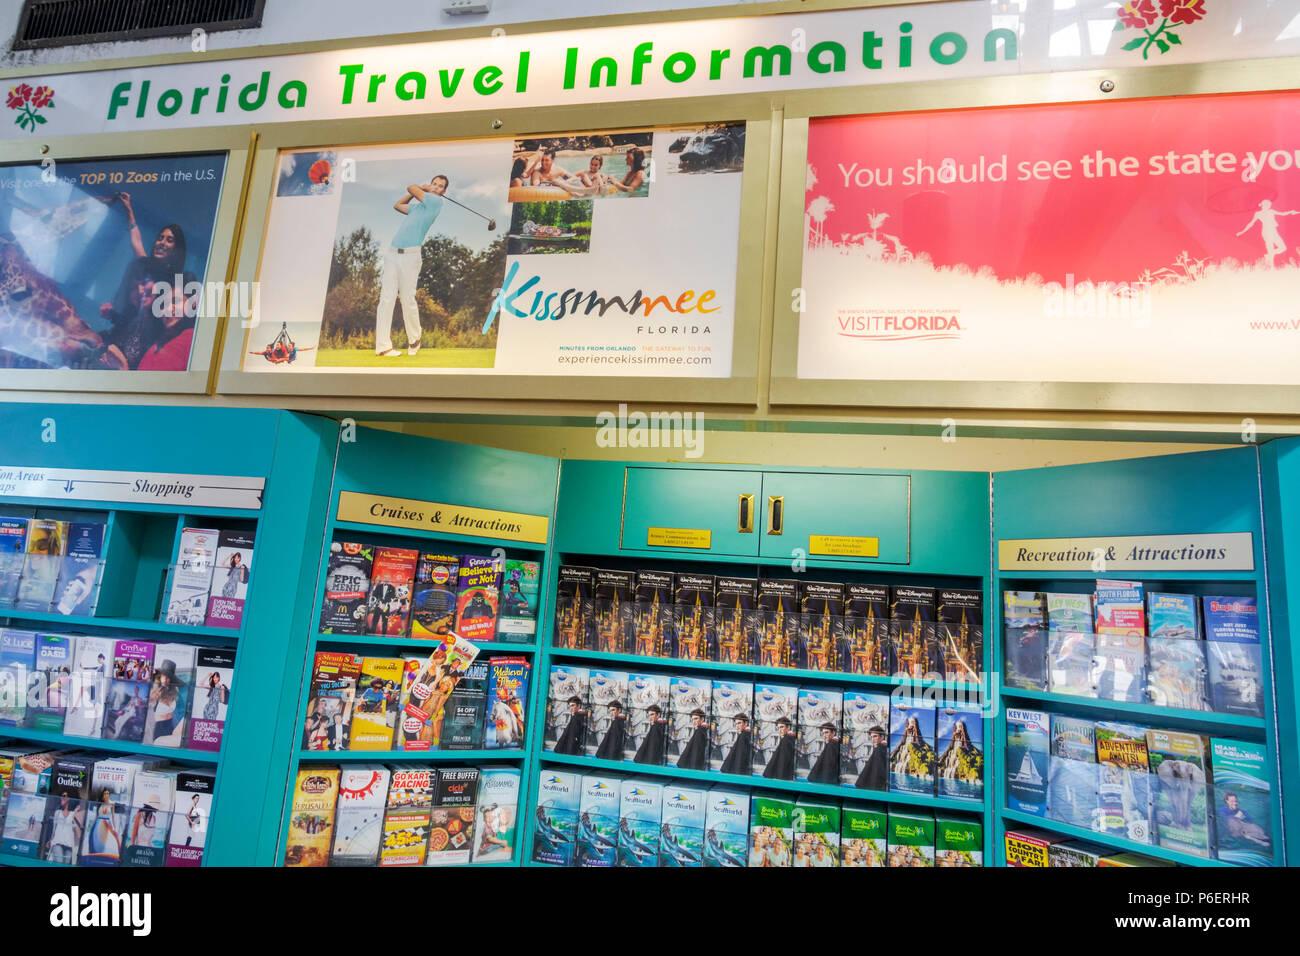 Fort Ft. Pierce Florida Florida Turnpike Toll Road rest stop Reiseinformationen Broschüren free Stockbild